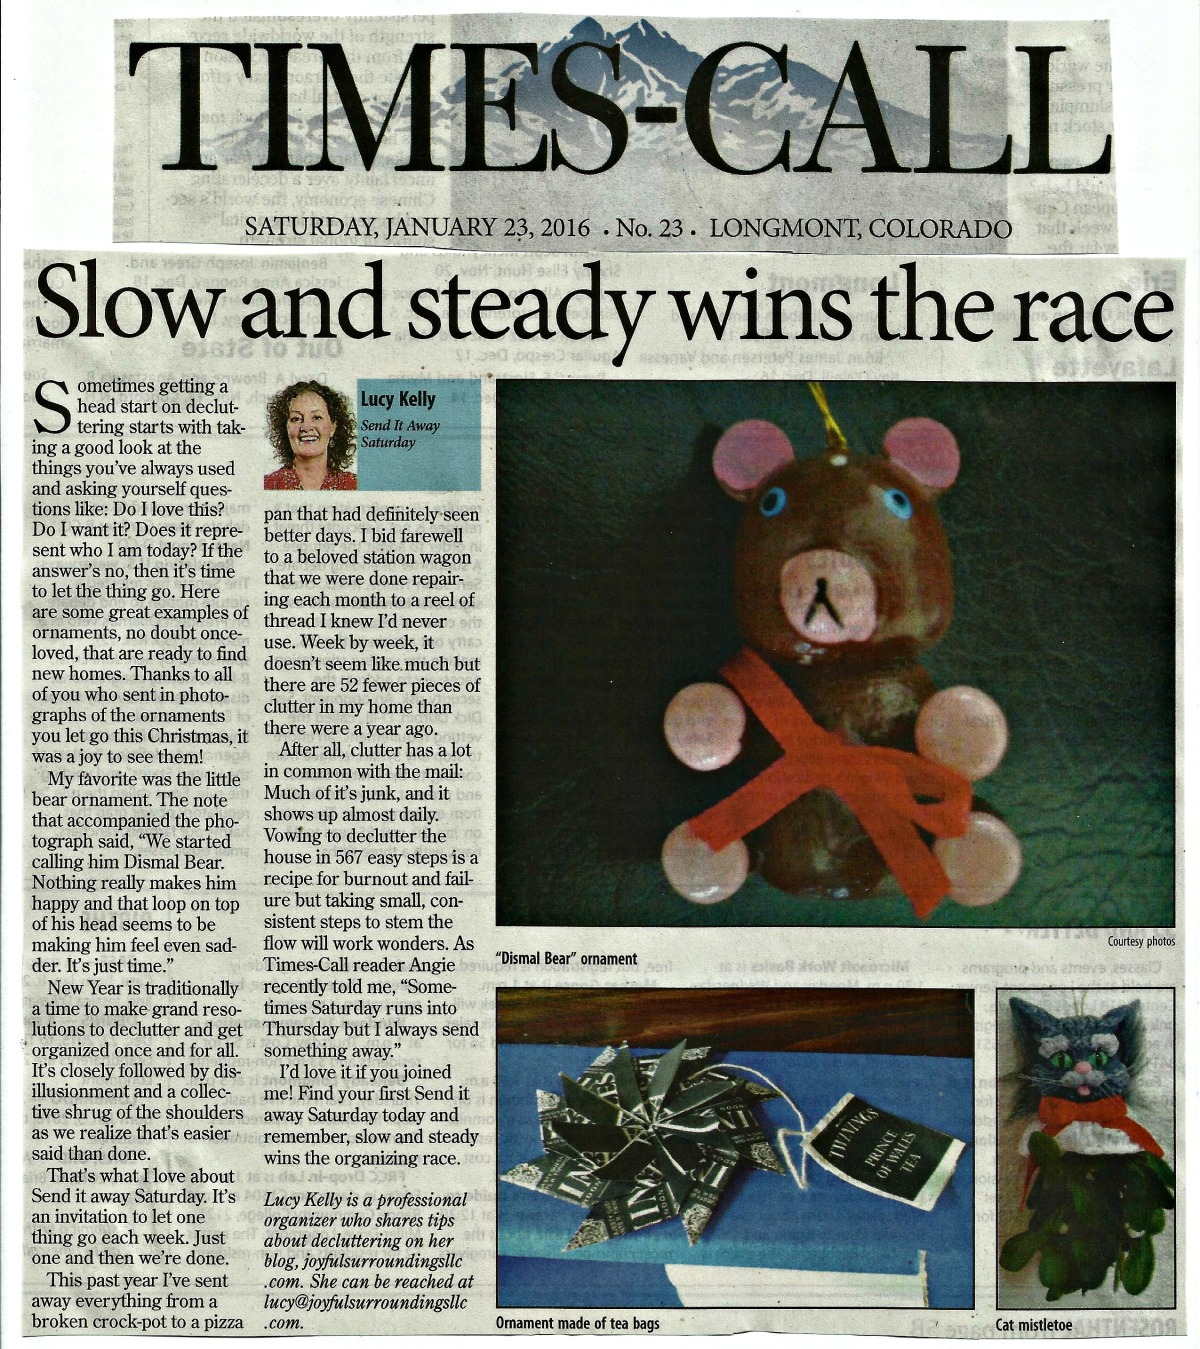 Longmont Times-Call Send it away Saturday column January 2016